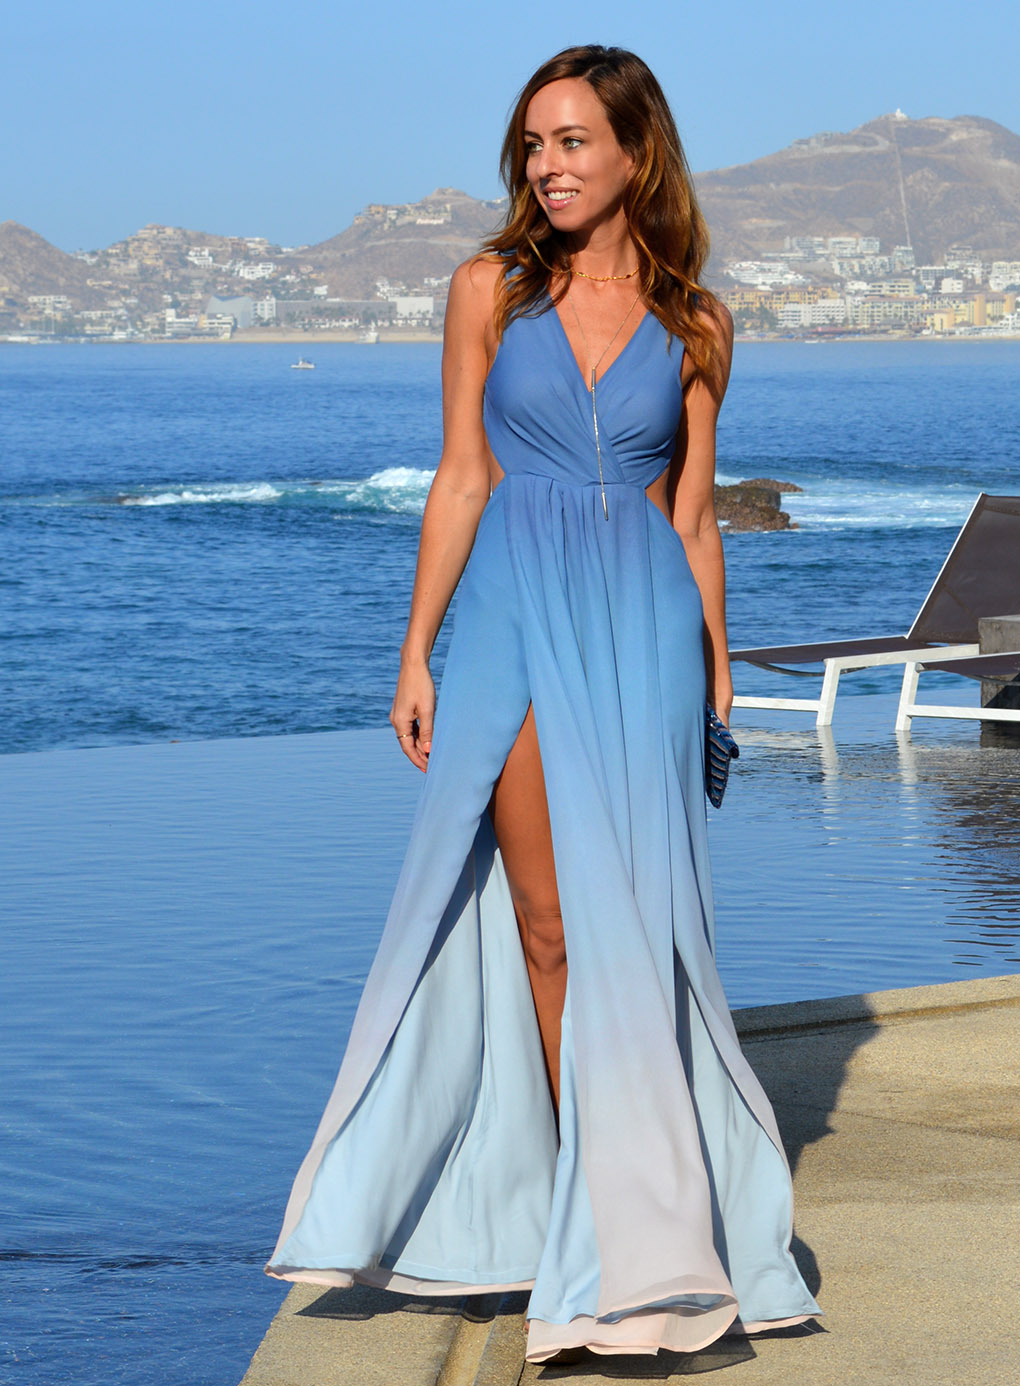 beach wedding dresses for guests uk beach wedding dresses guest Dresses For Beach Wedding Guest Uk